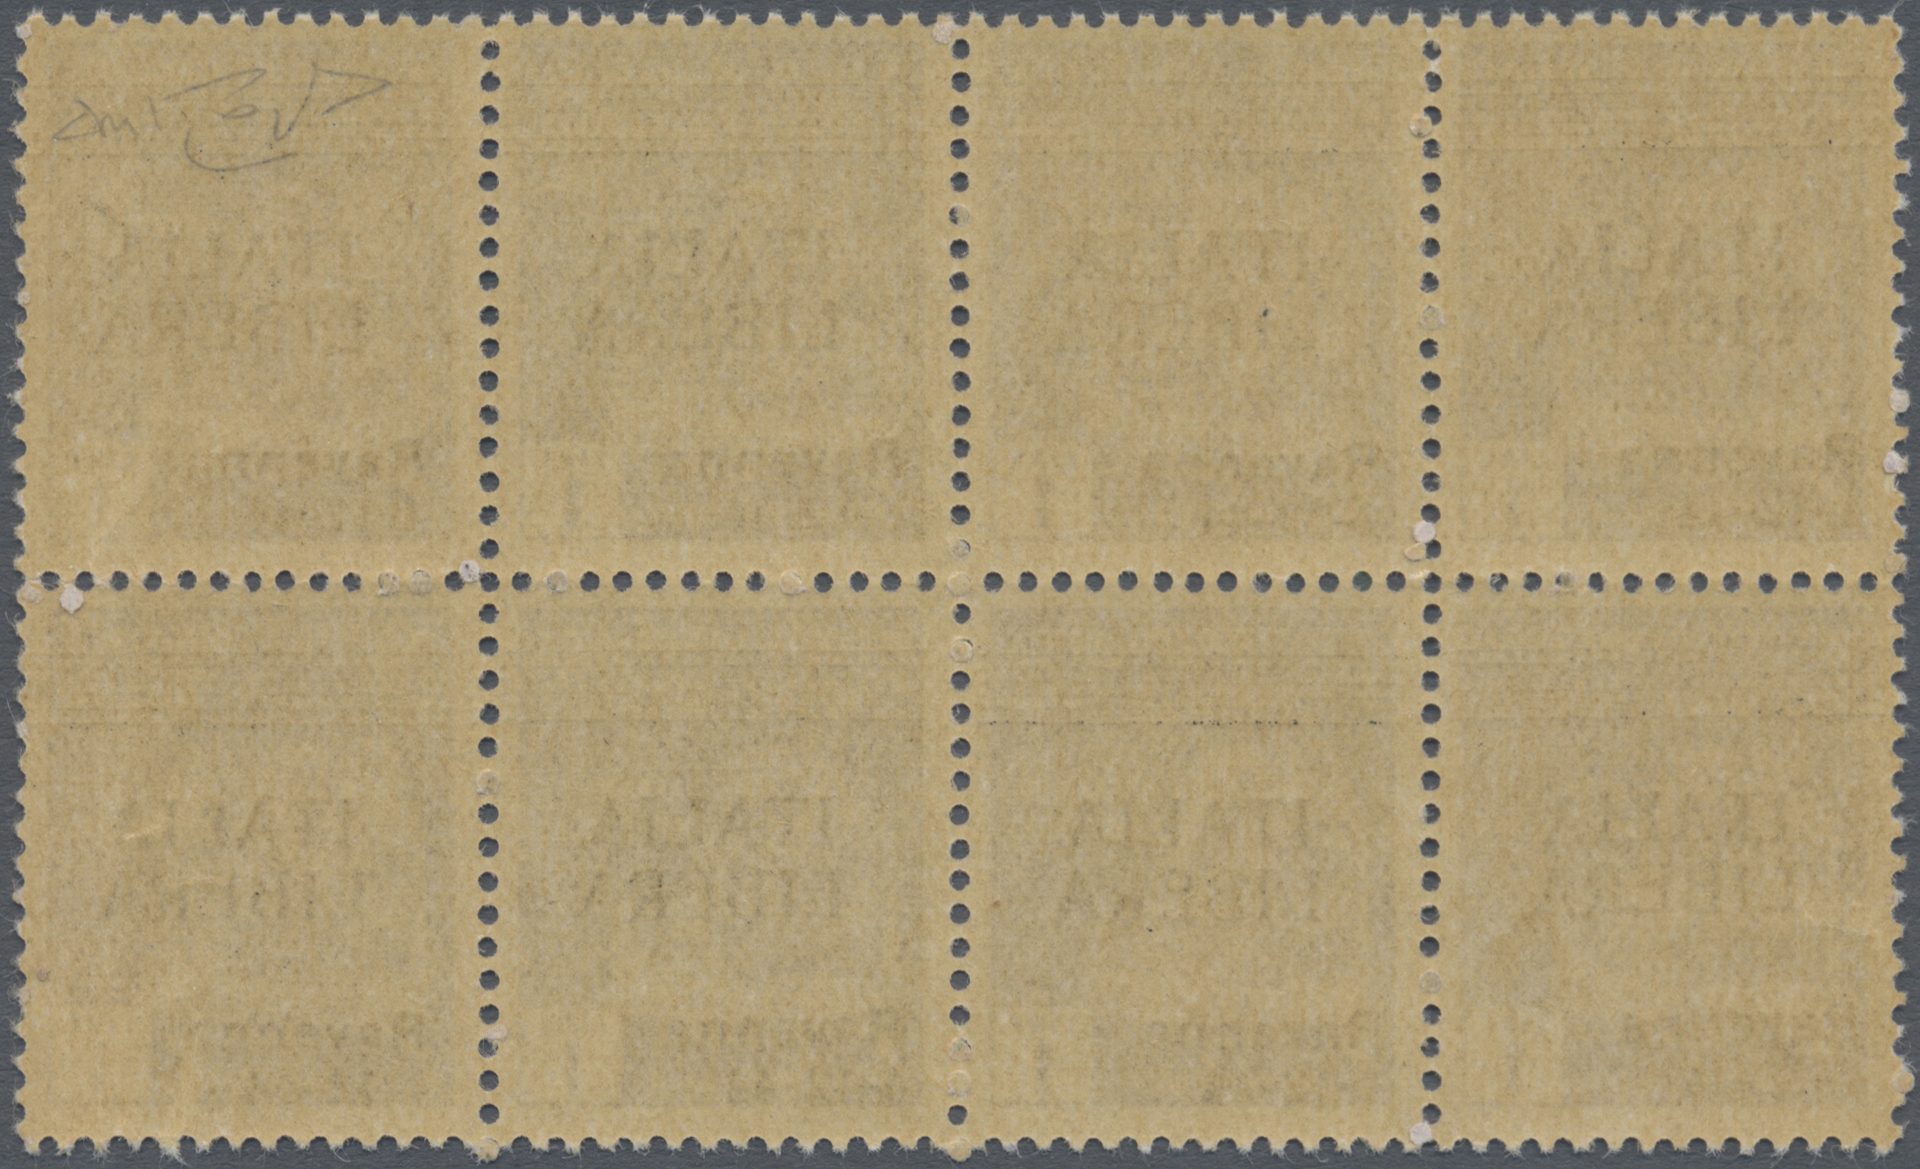 Lot 09106 - Italien - Lokalausgaben 1944/45 - Ravenna  -  Auktionshaus Christoph Gärtner GmbH & Co. KG Sale #48 The Single Lots Philatelie